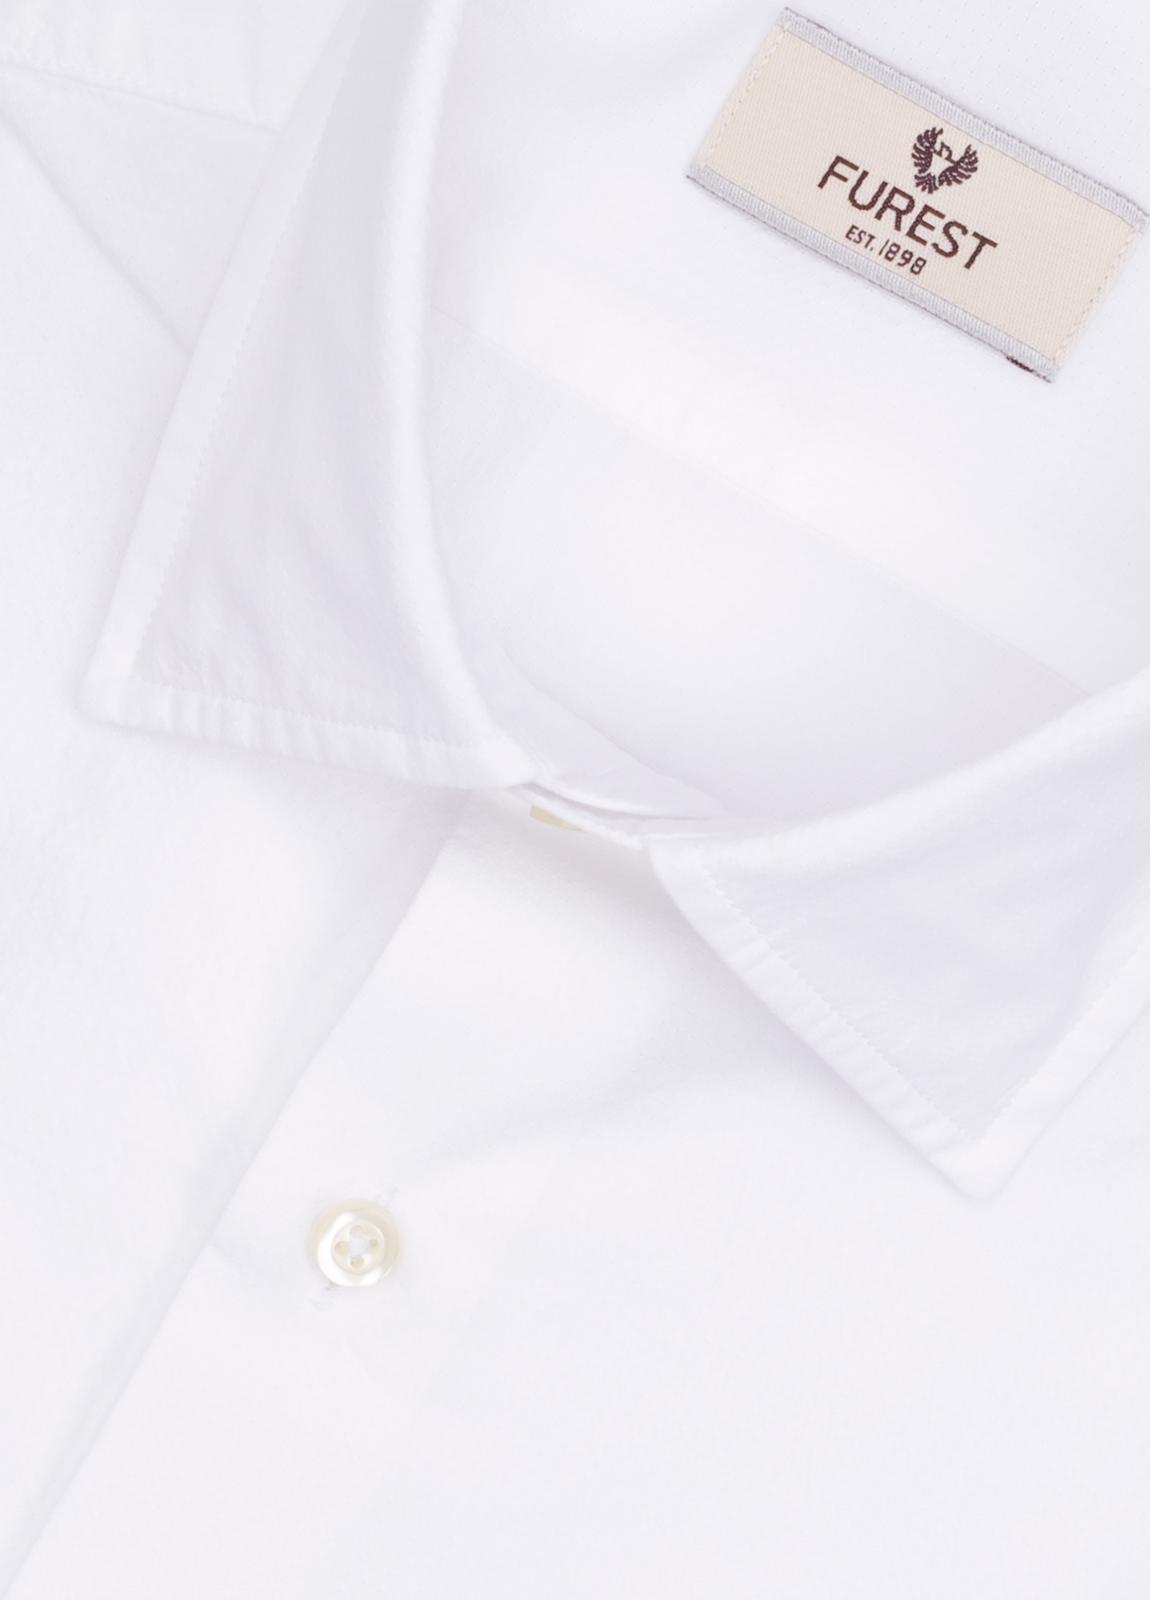 Camisa Leisure Wear SLIM FIT modelo PORTO color blanco. 100% Algodón. - Ítem1